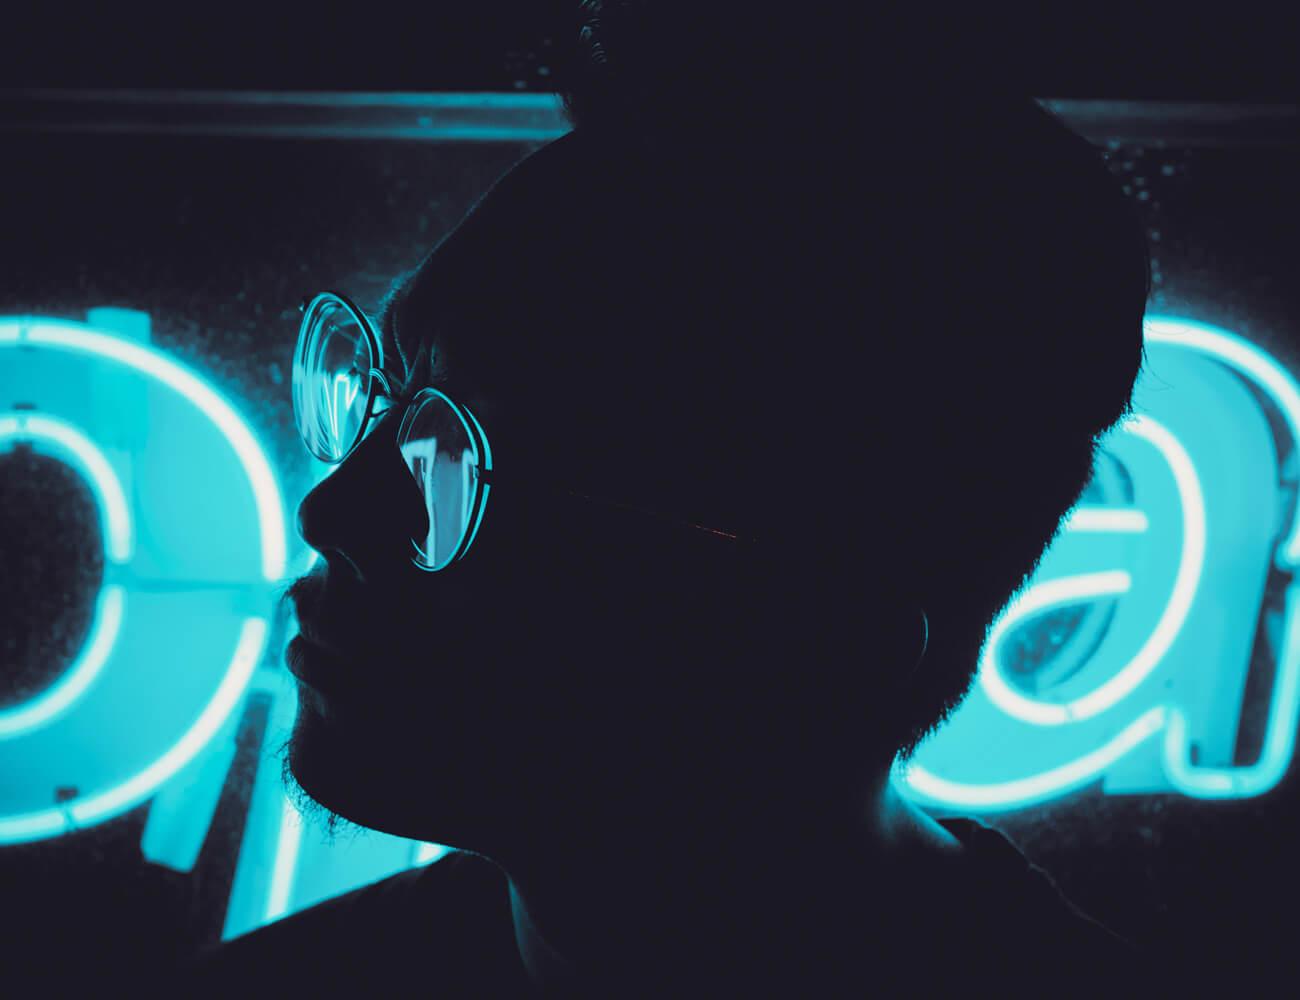 Night Neon Mood